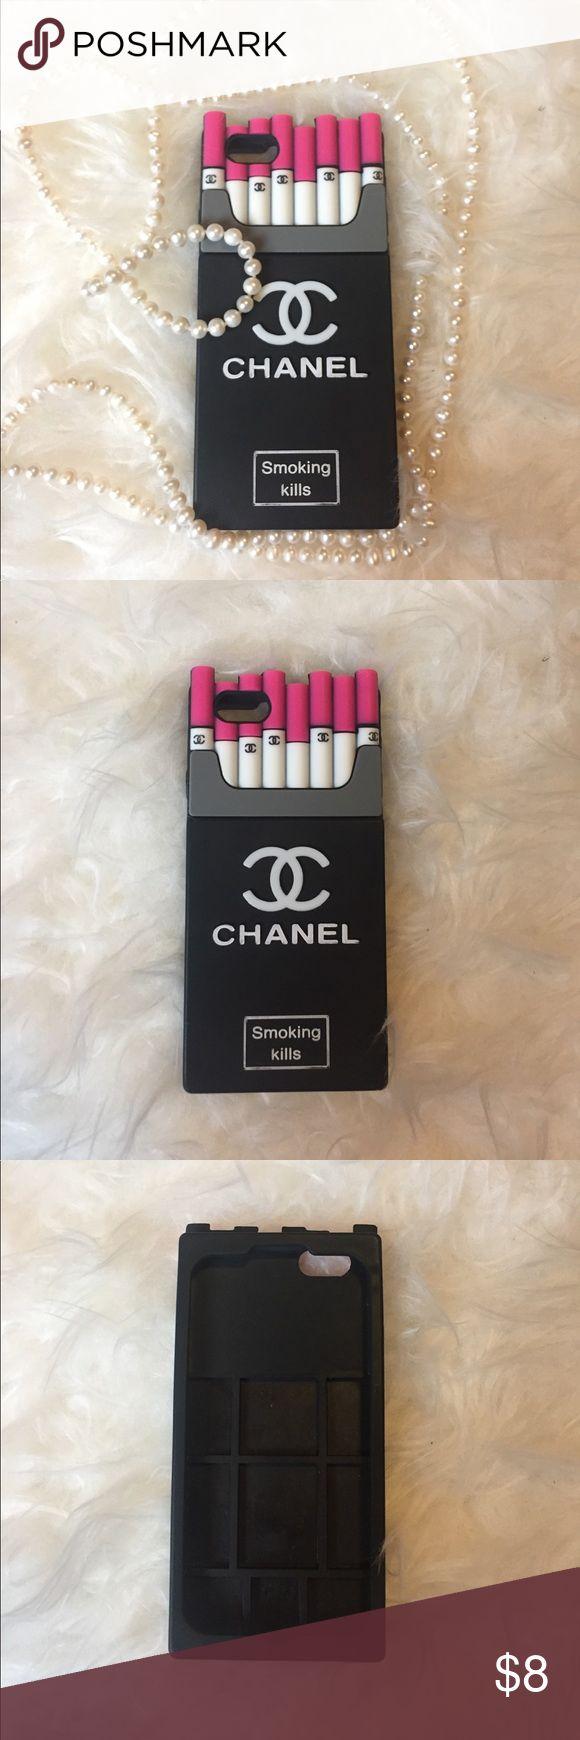 best 25 chanel phone case ideas on pinterest chanel